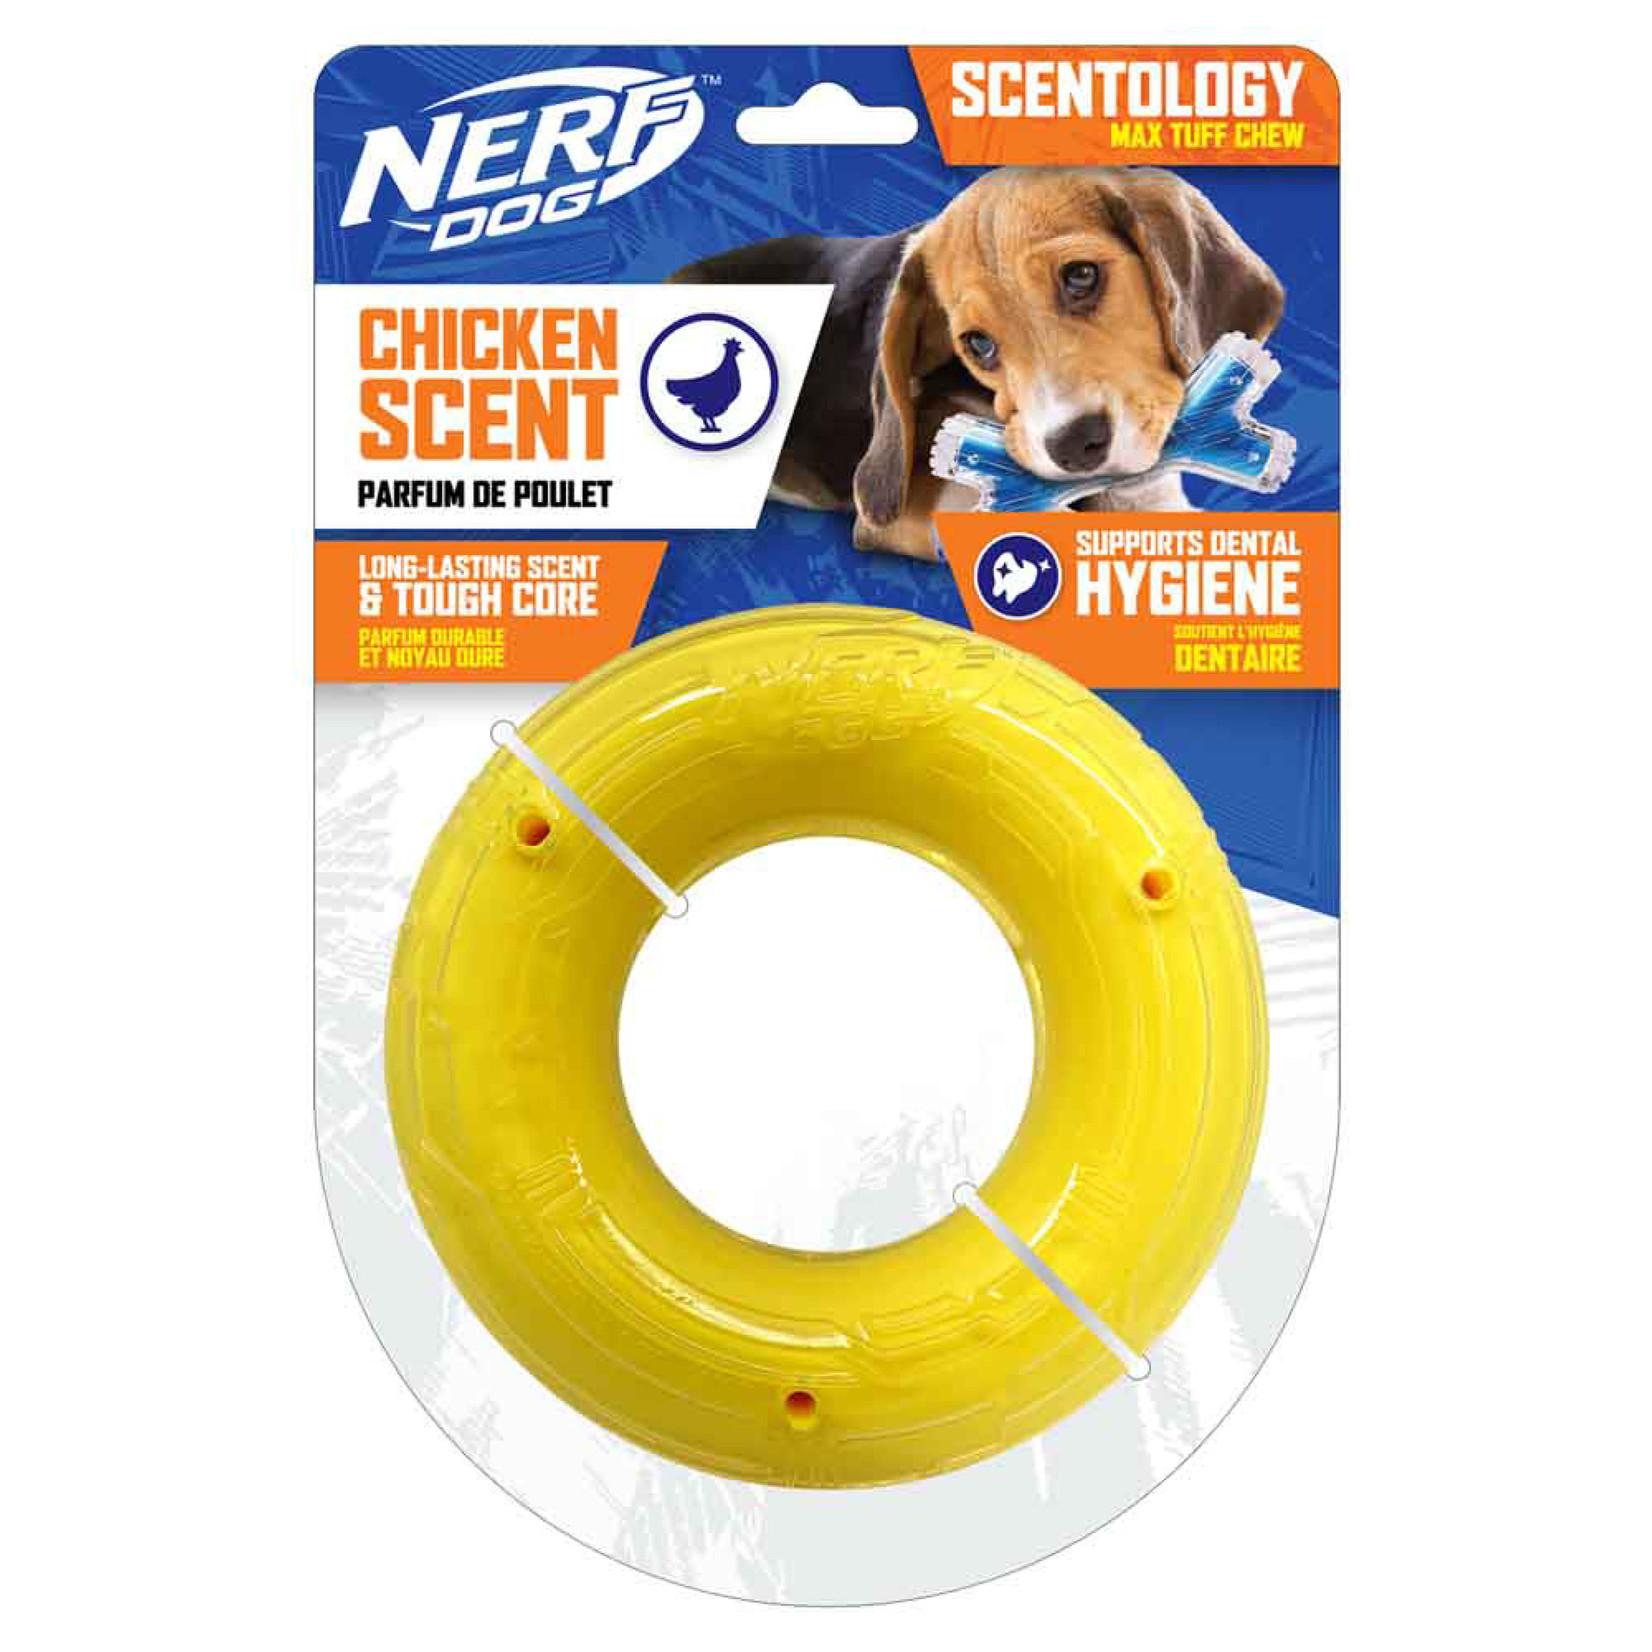 NR DogScentology Lg Ring,Chicken-NF-7129